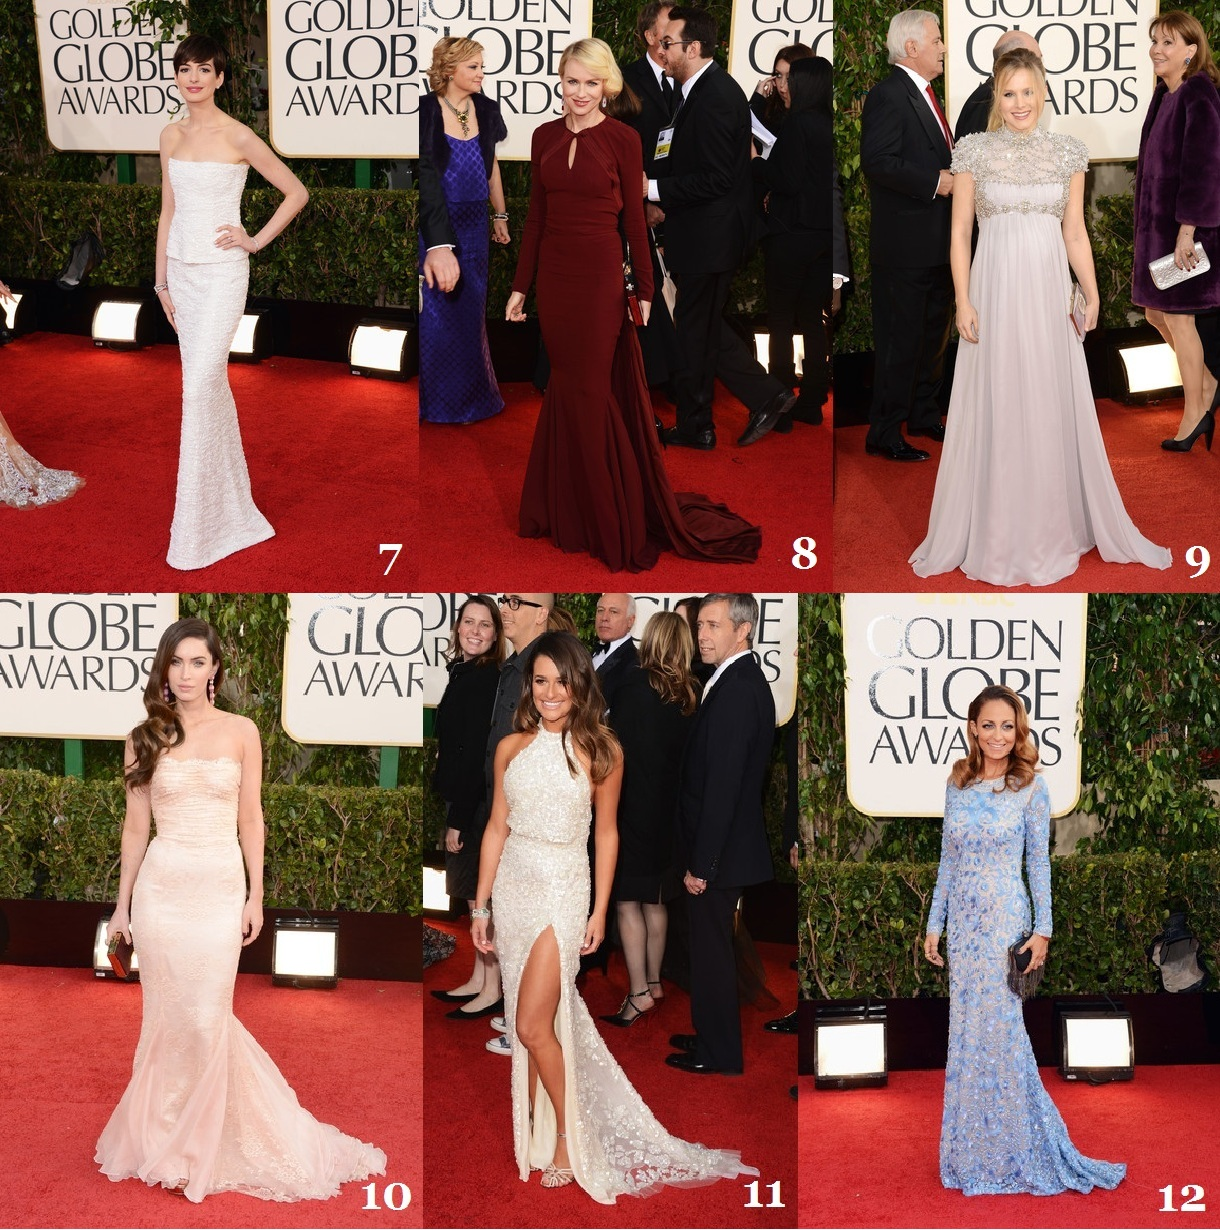 http://3.bp.blogspot.com/-R6KK6ZStylM/UPcdCDzIRjI/AAAAAAAAEZA/FJEoL1rCYLc/s1600/Anne+Hathaway+70th+Annual+Golden+Globe+Awards+x9lD8qMHY54l.jpg